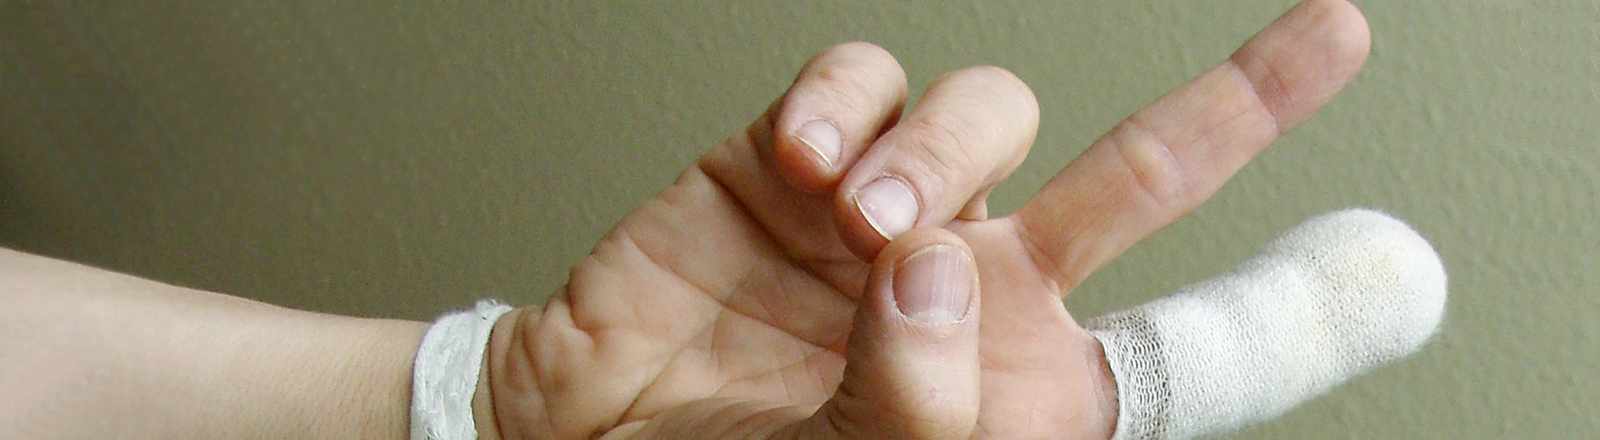 verletzte Finger